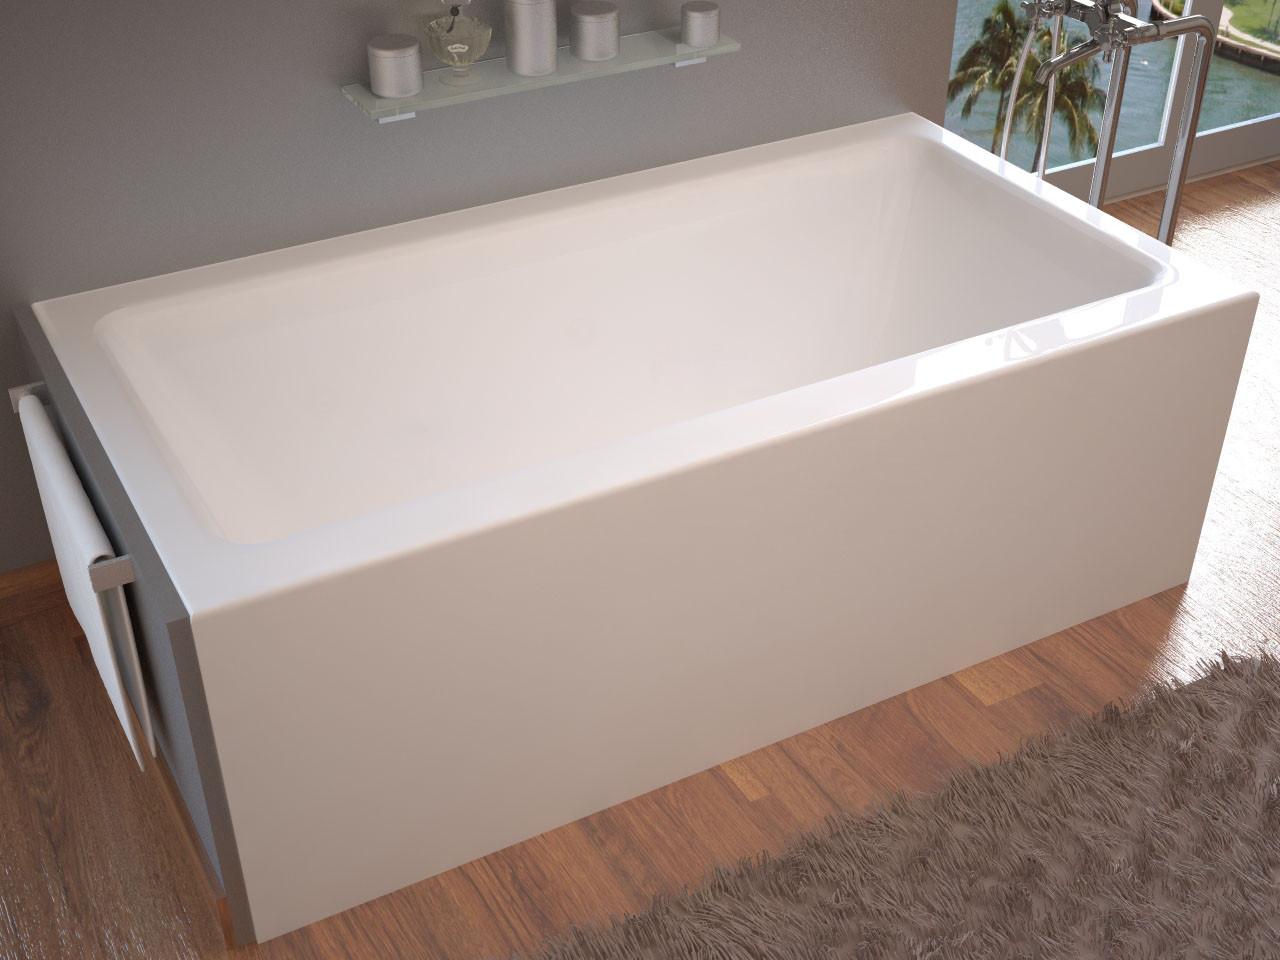 MediTub 3060SHR Atlantis Soho 30 x 60 Front Skirted Tub With Right Drain